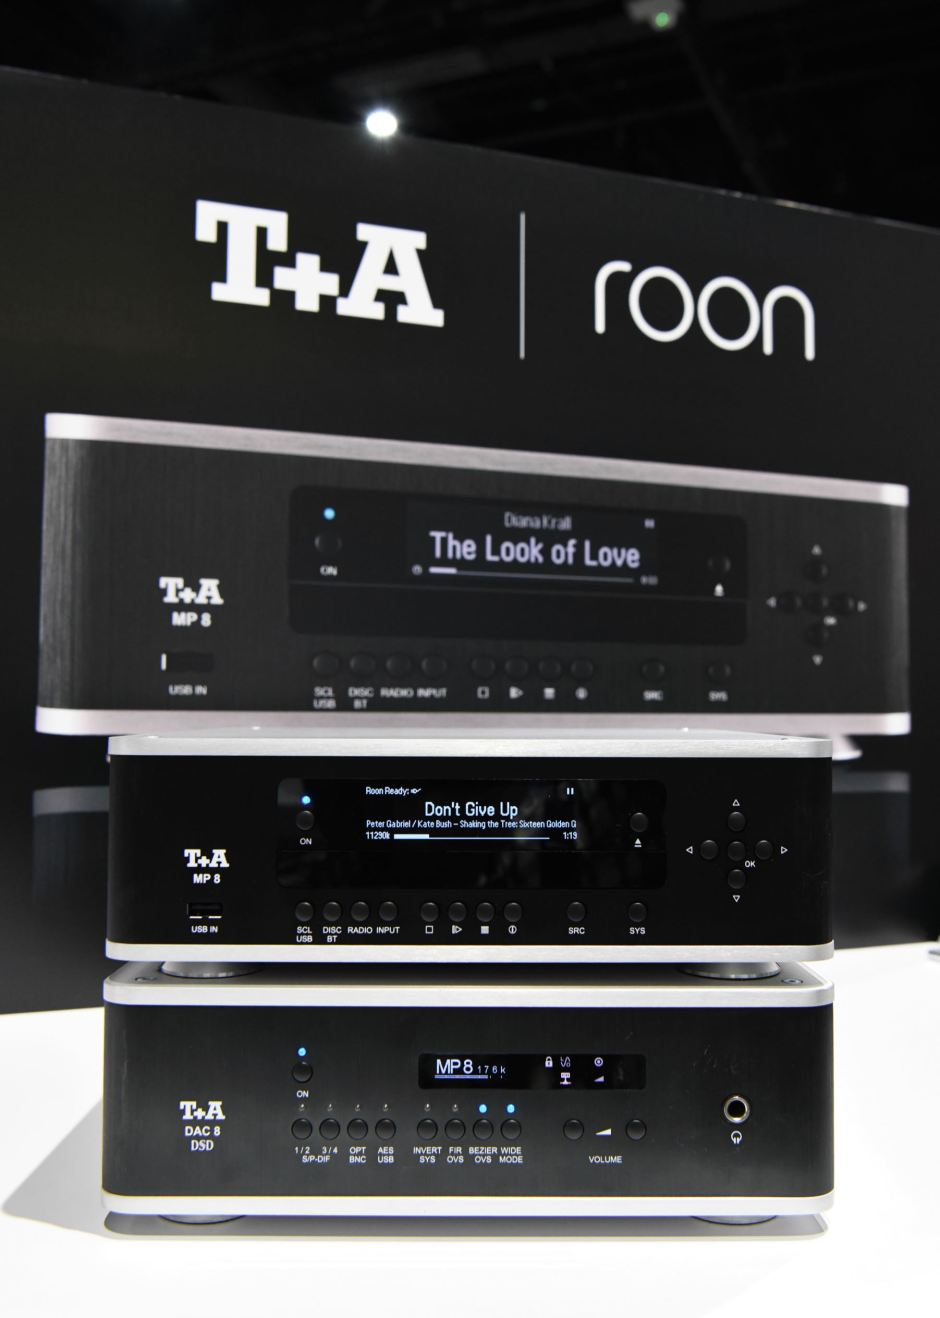 CEDIA 2018: T+A  Series 8 brings Roon and MQA